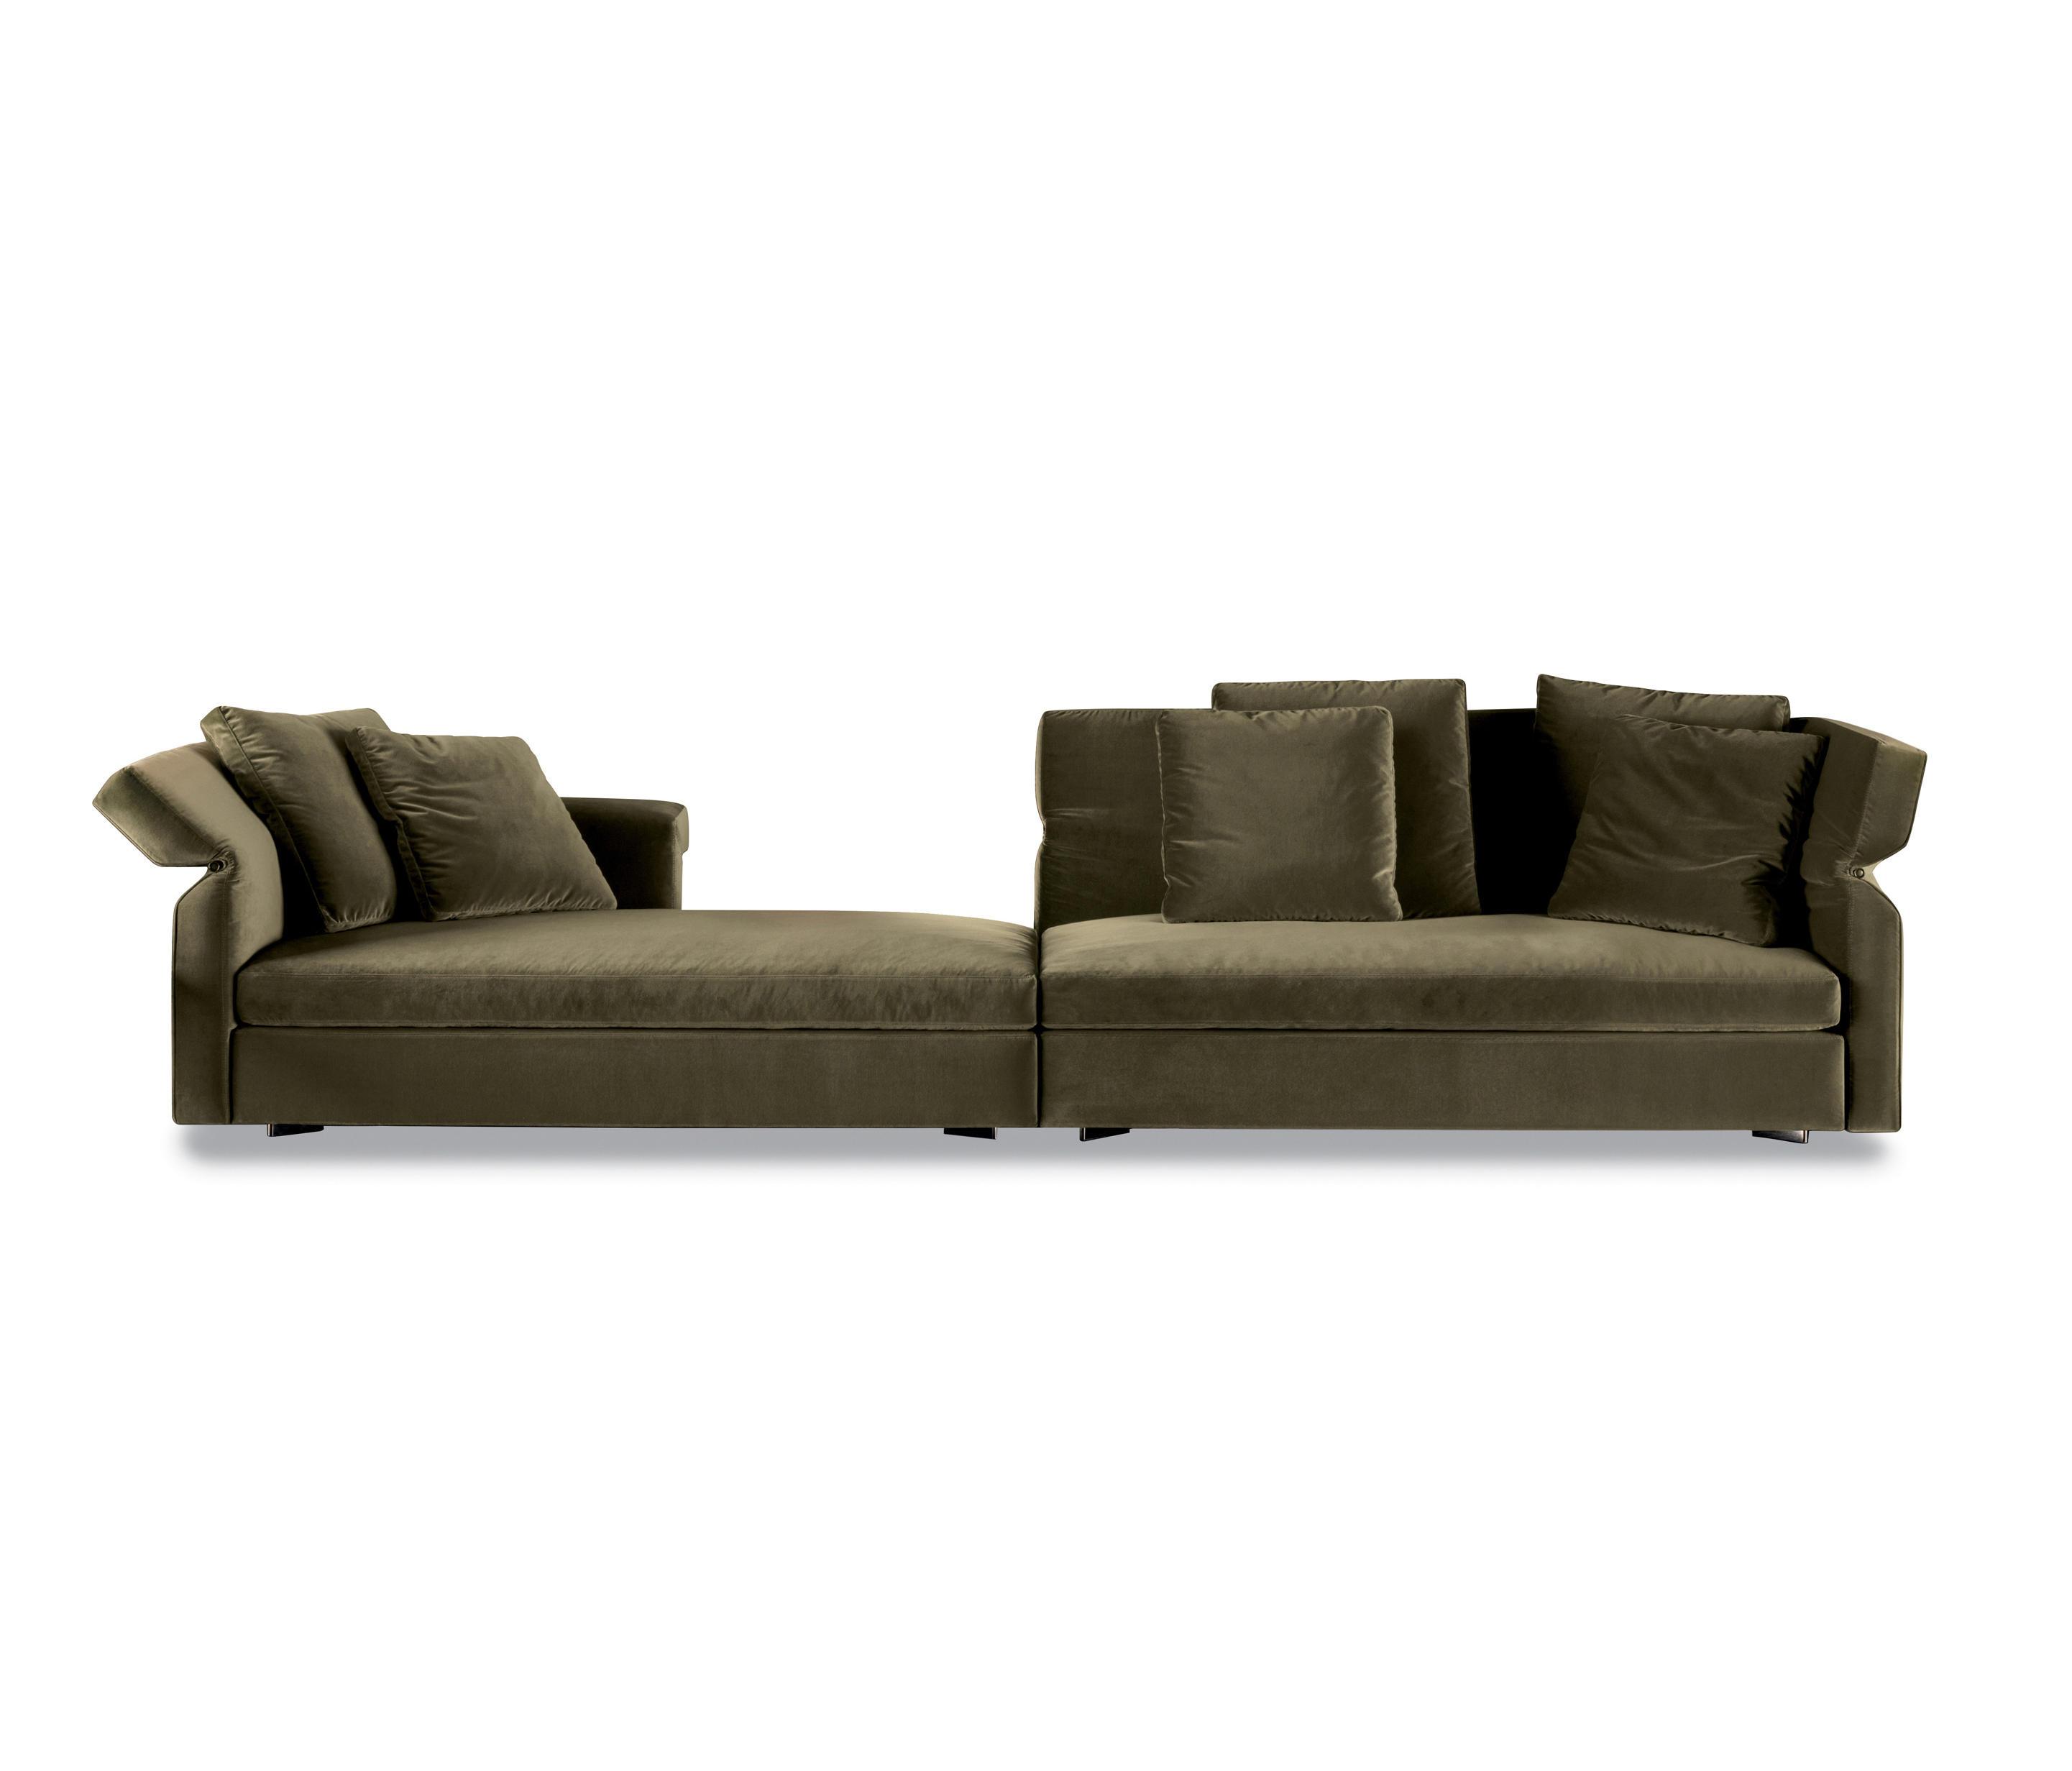 Collar lounge sofas from minotti architonic - Divano minotti prezzo ...